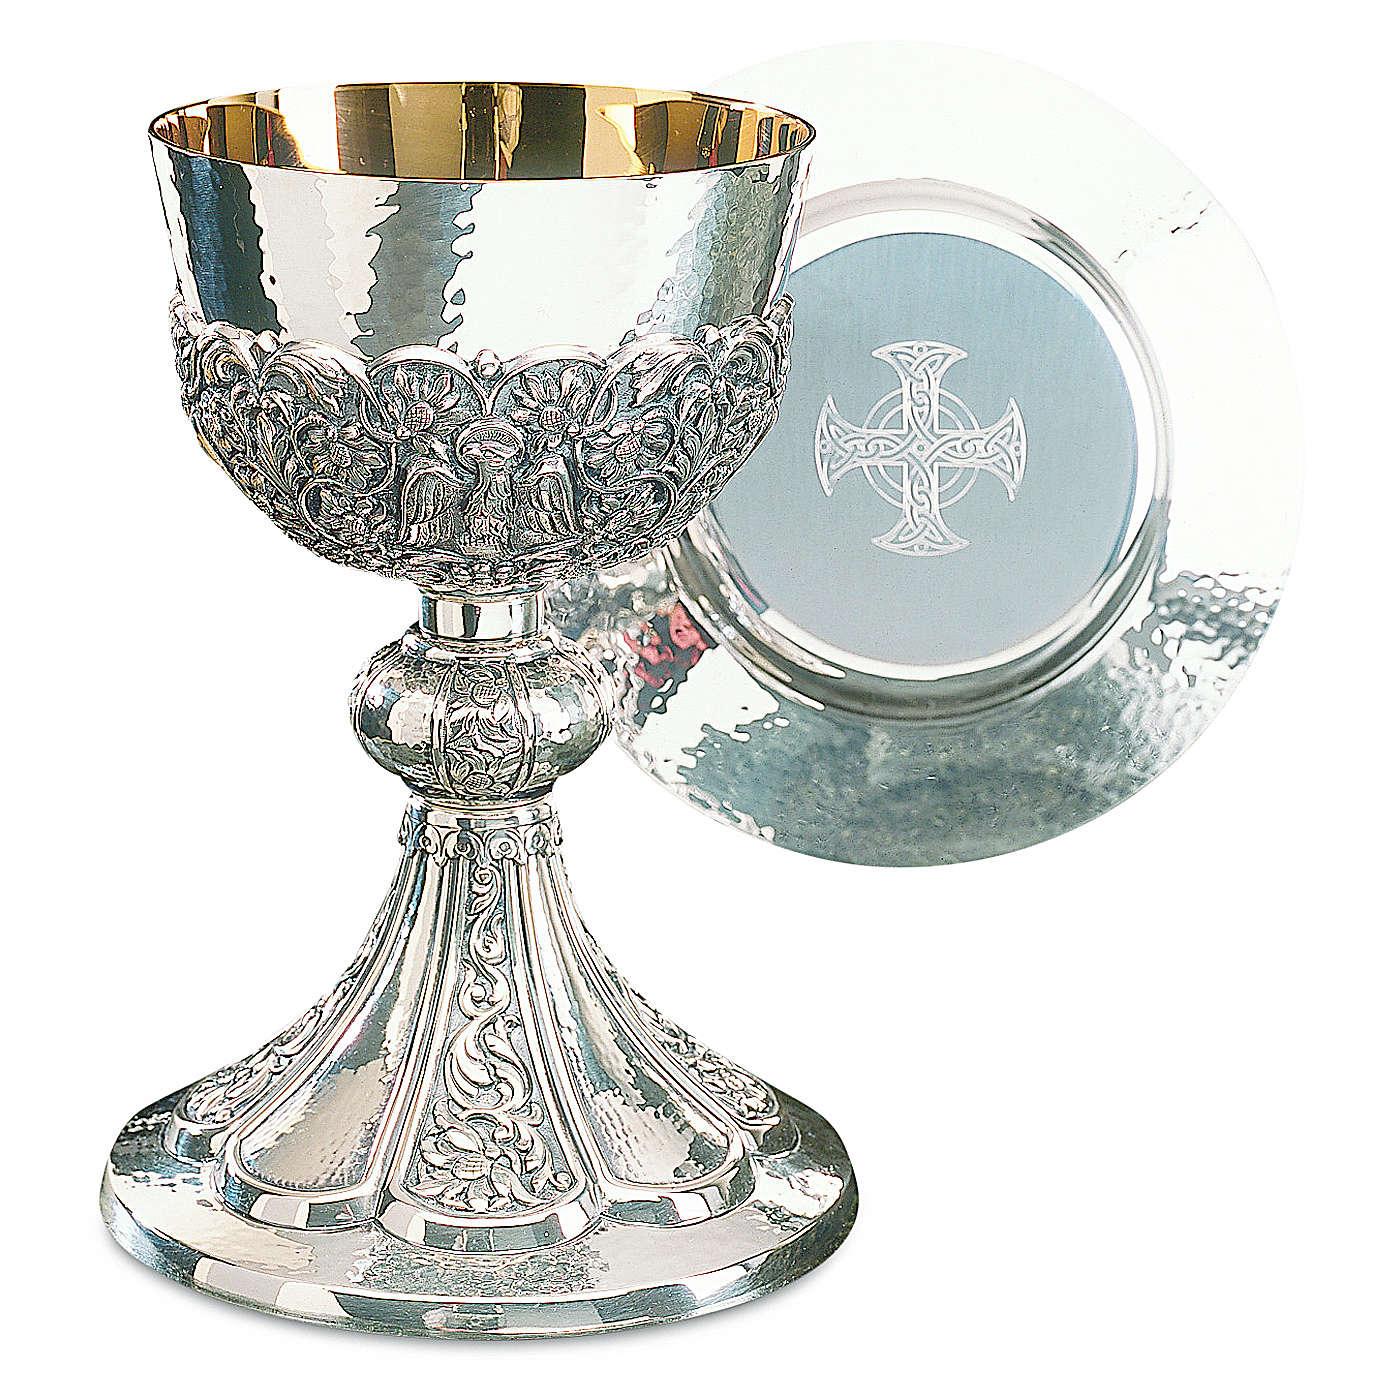 Calice patena Molina mod. Bizantino argento 925 4